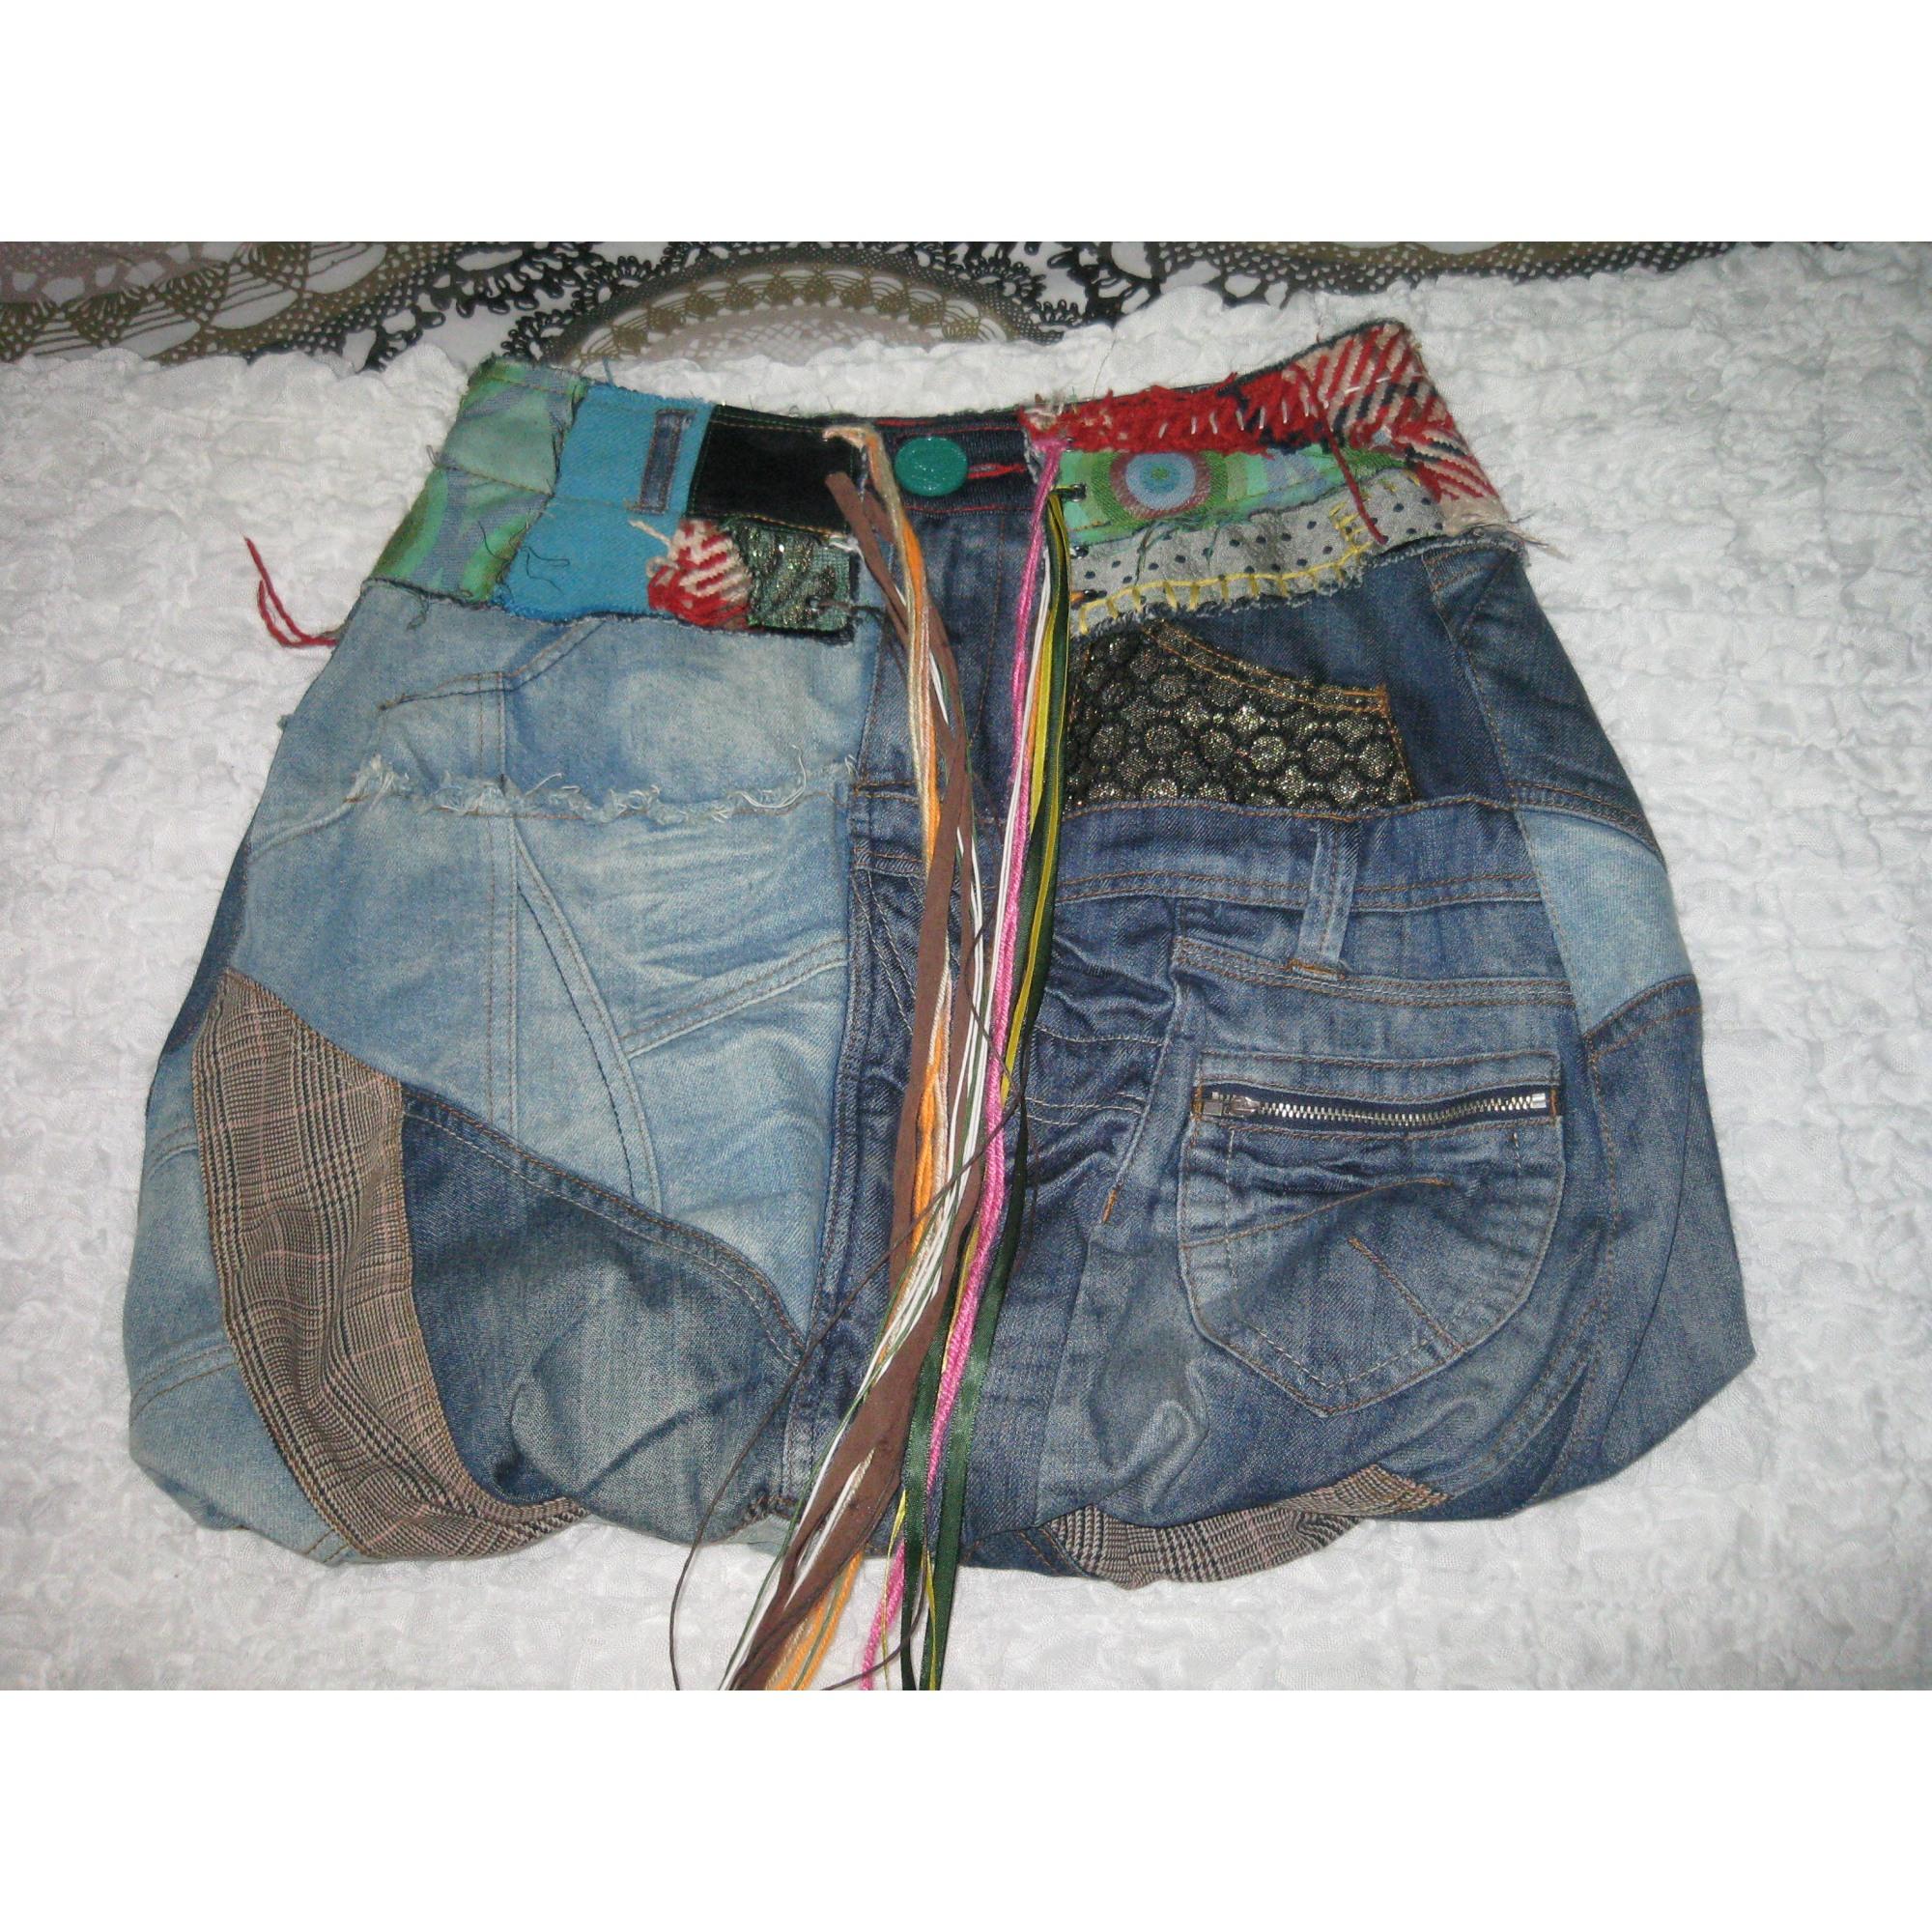 jupe en jean desigual 34 xs t0 jeans vendu par. Black Bedroom Furniture Sets. Home Design Ideas